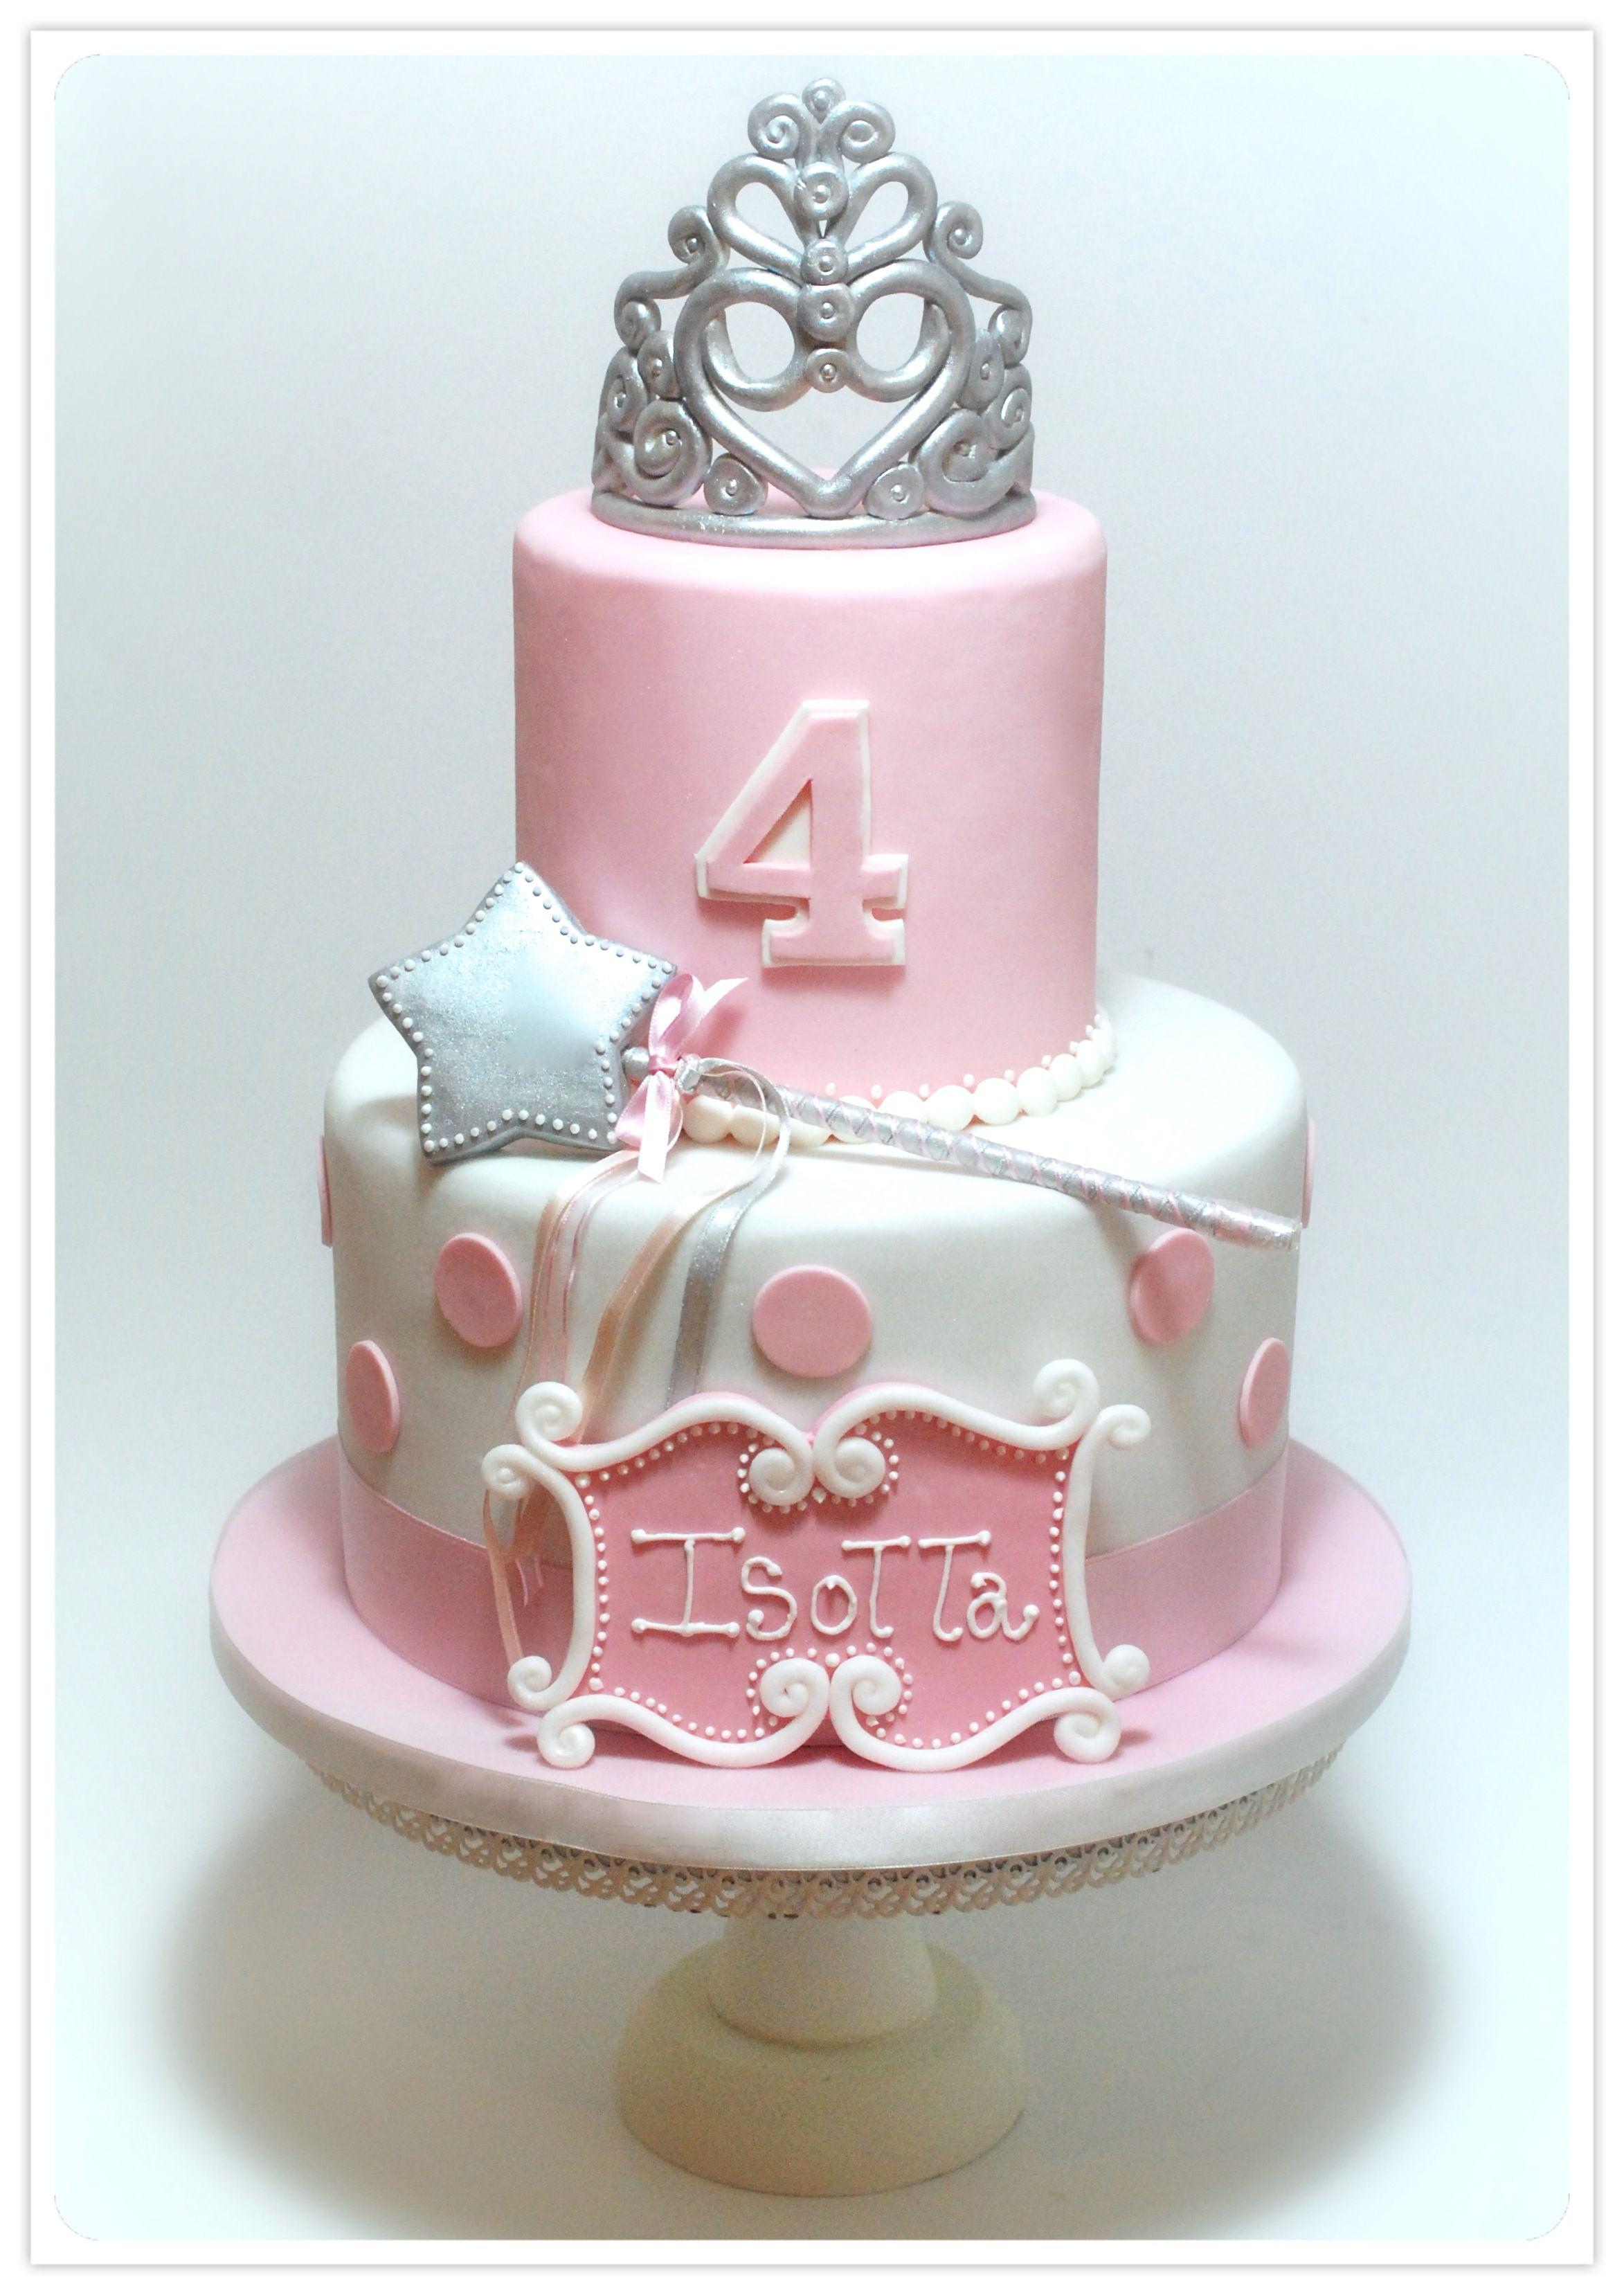 PRINCESS CROWN CAKE childrens cake Pinterest Princess crown